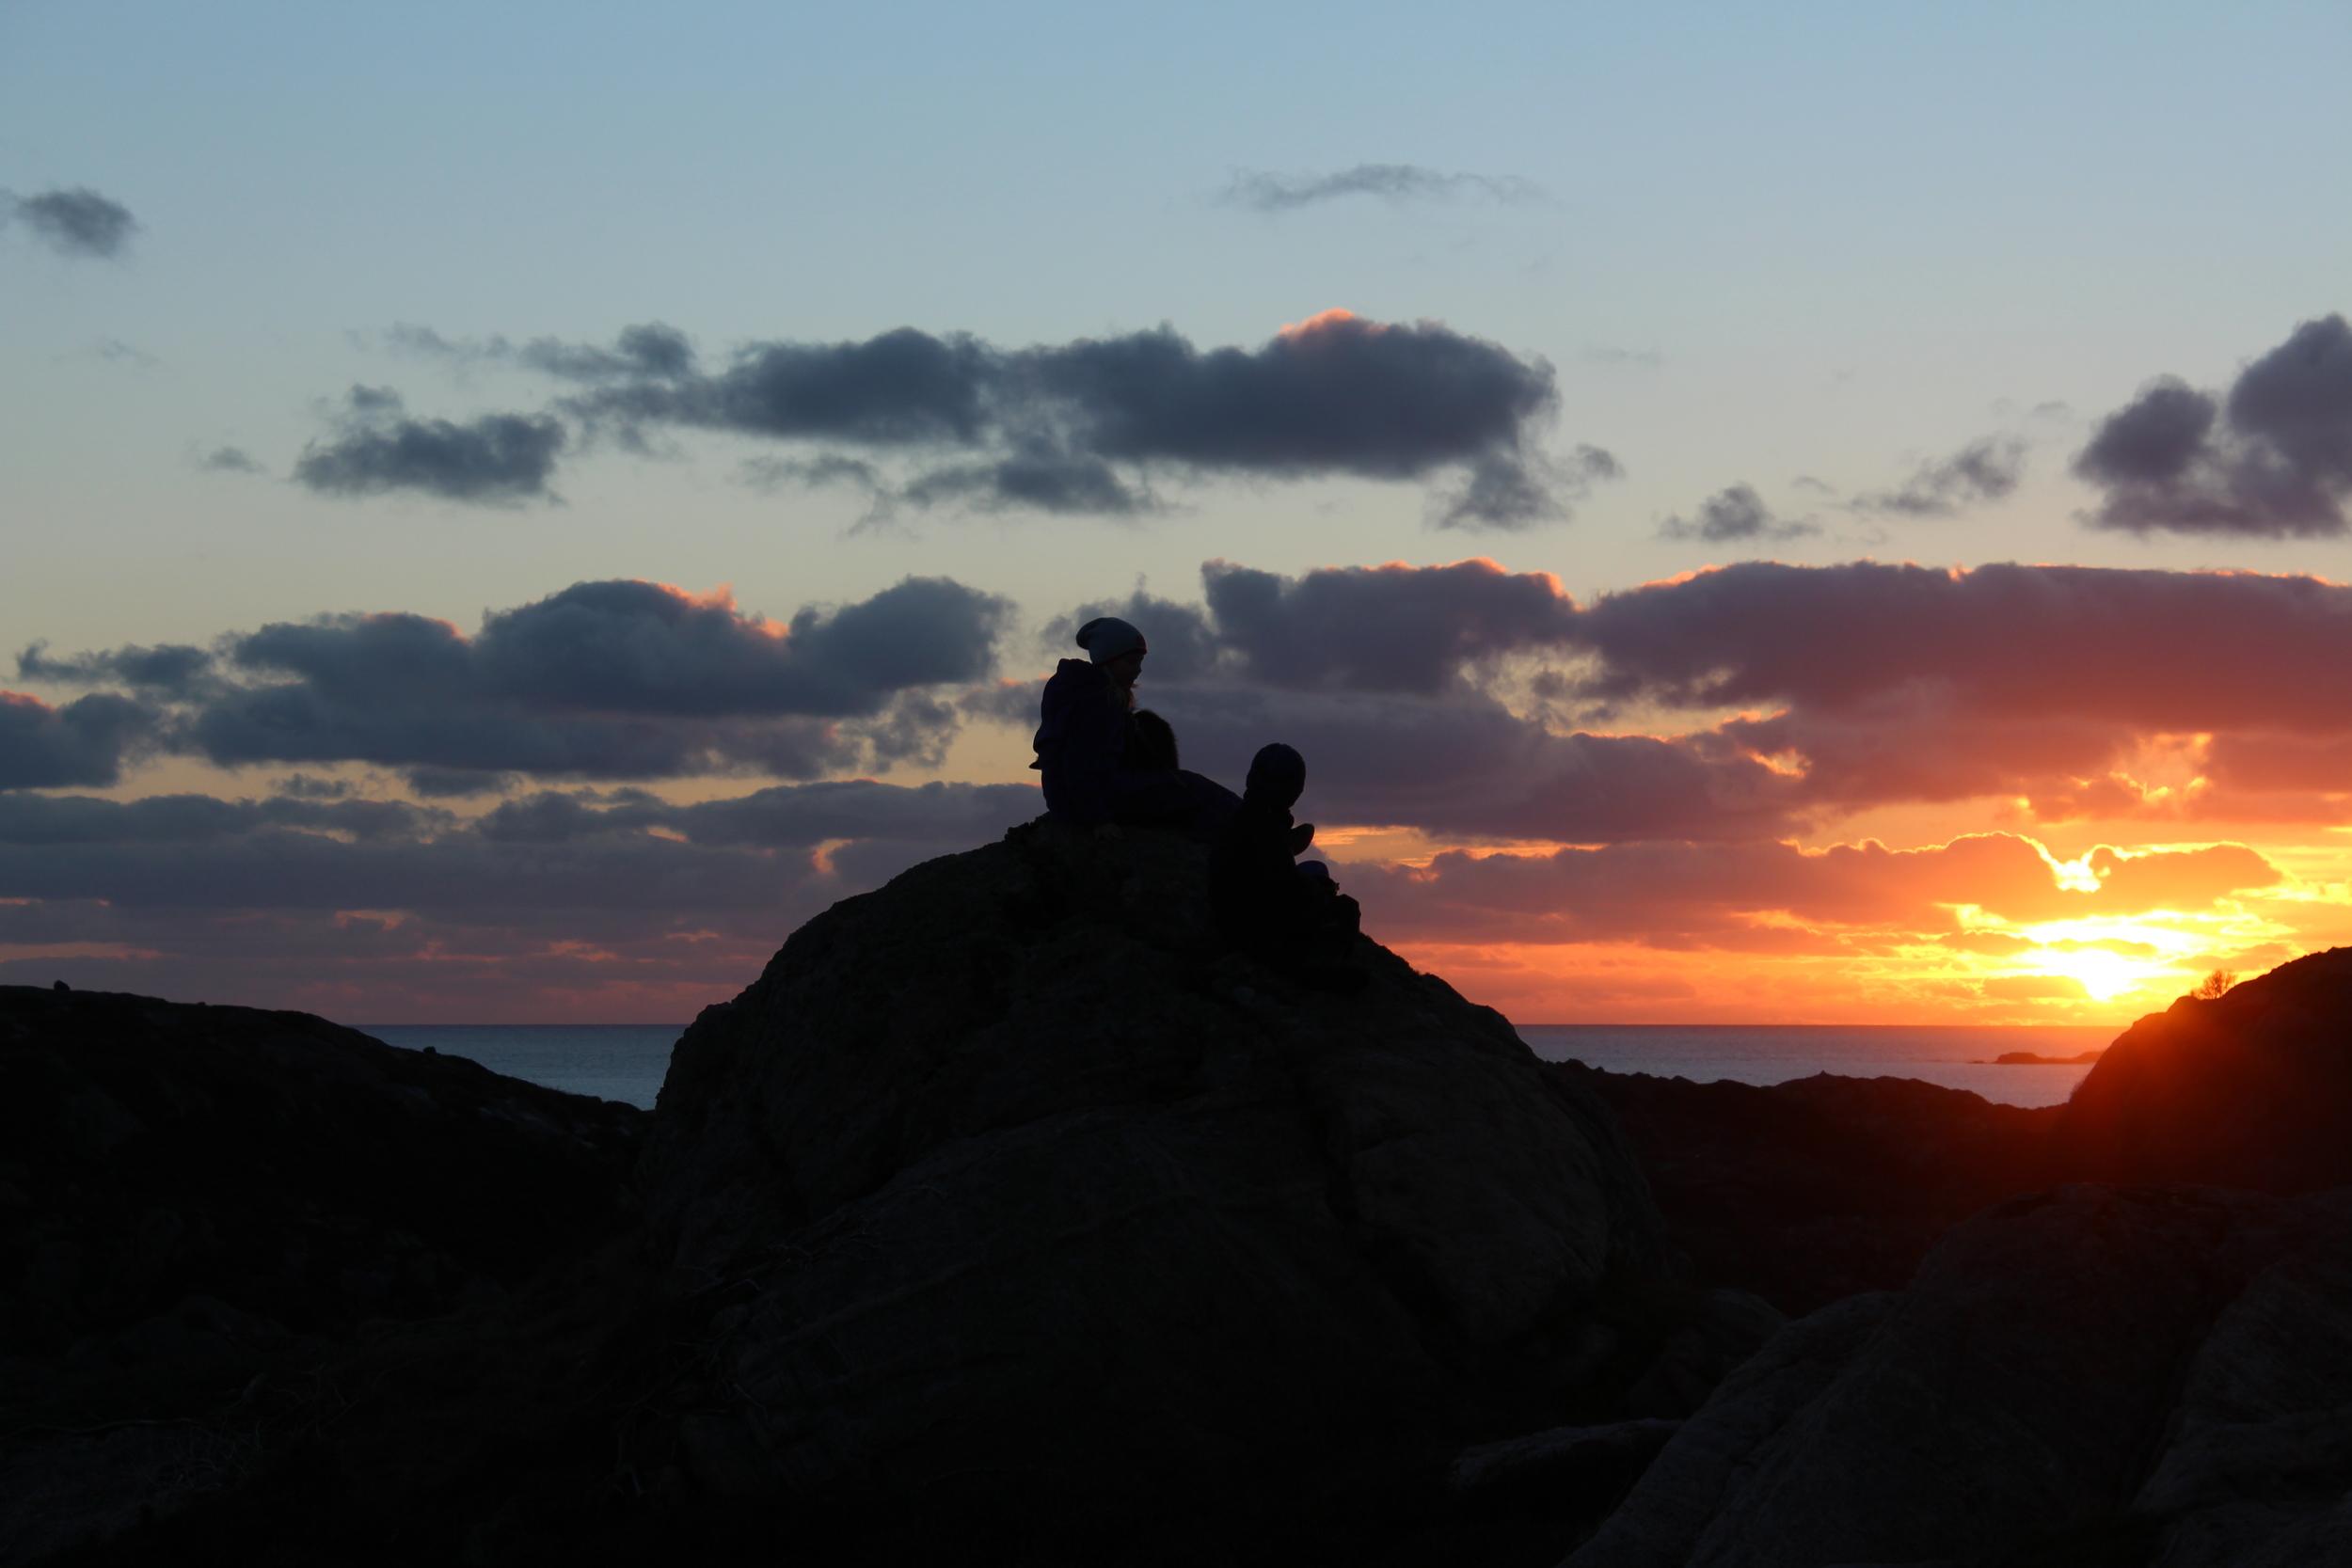 Foto: Anne Grønsund #Villroser